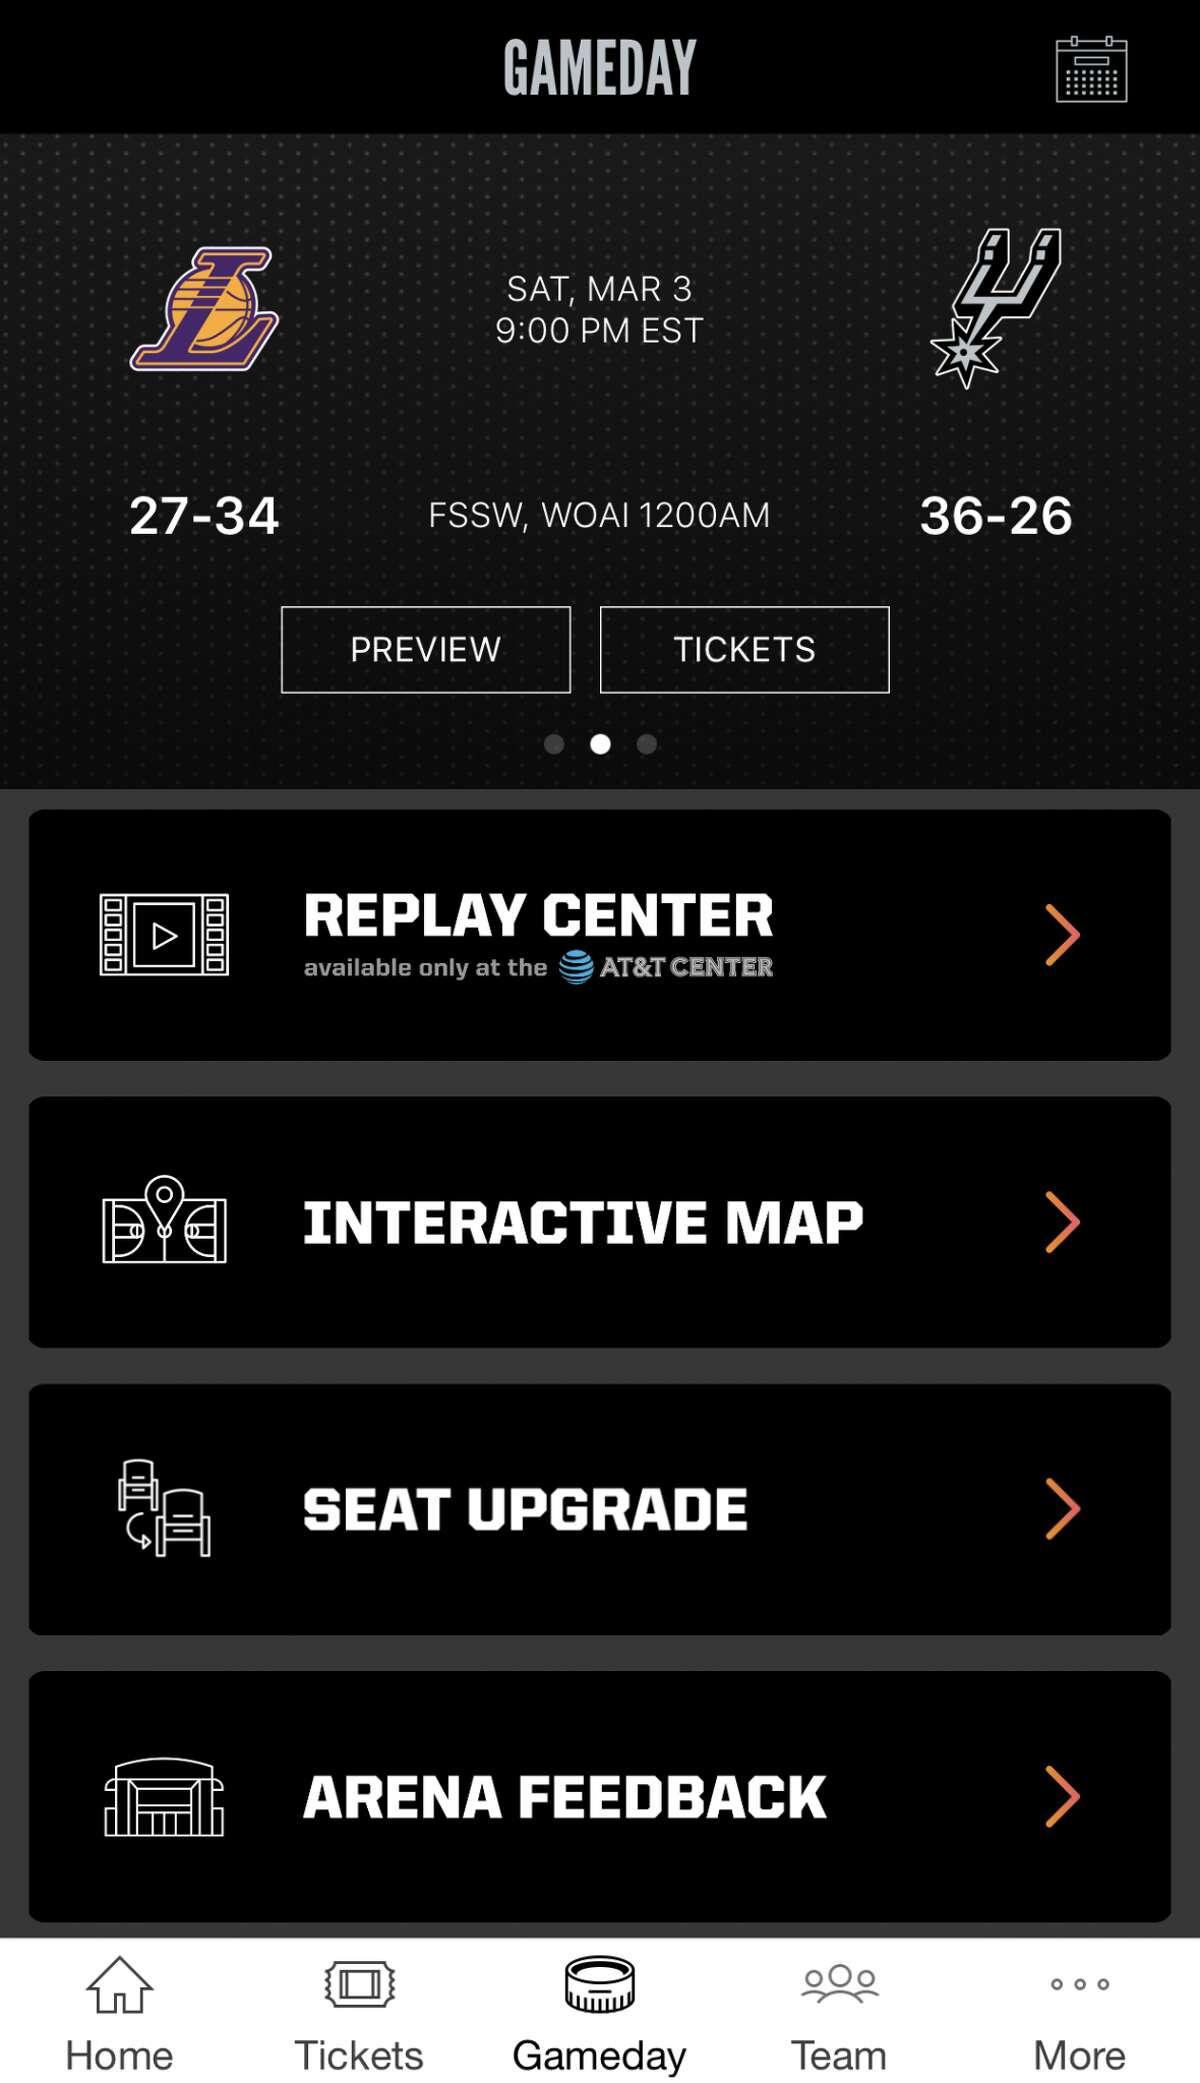 The redesigned menu page on the San Antonio Spurs mobile app.